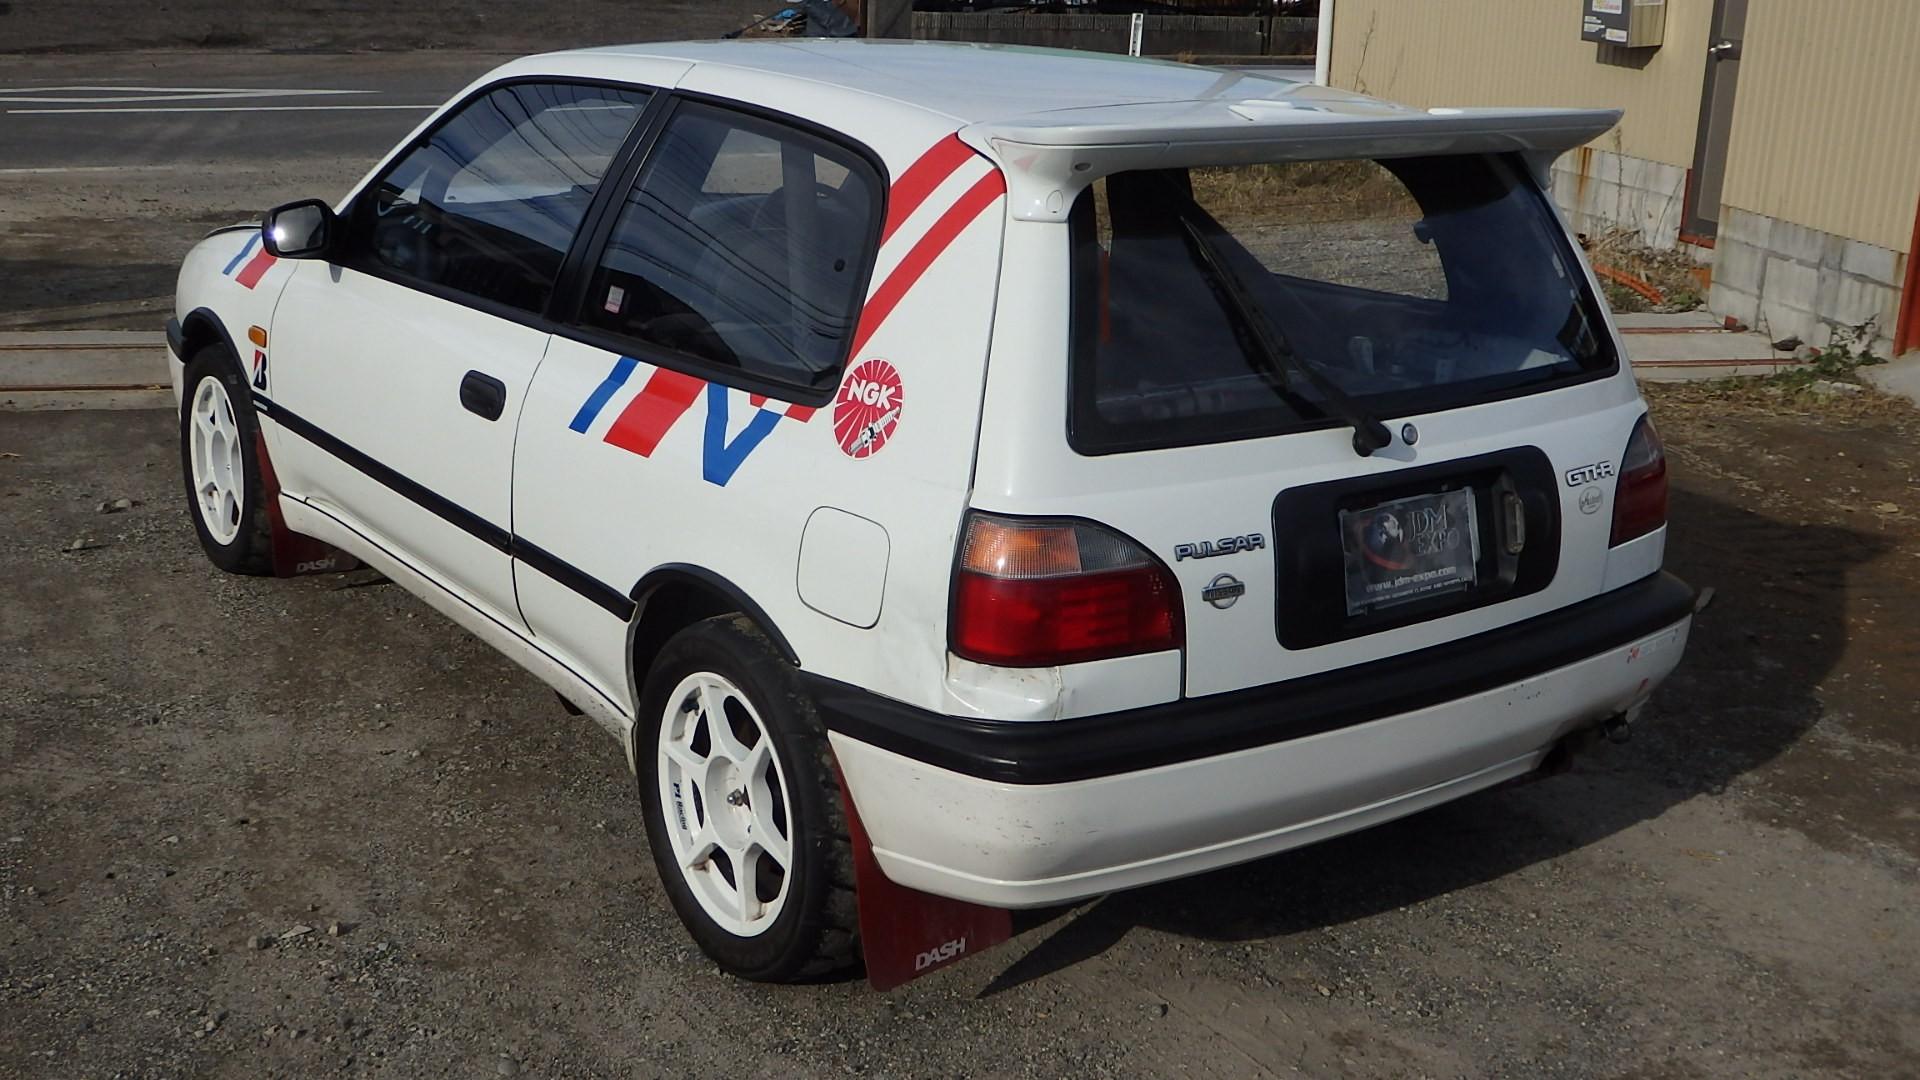 VOLKSWAGEN Used Cars for Sale - CAR JUNCTION JAPAN